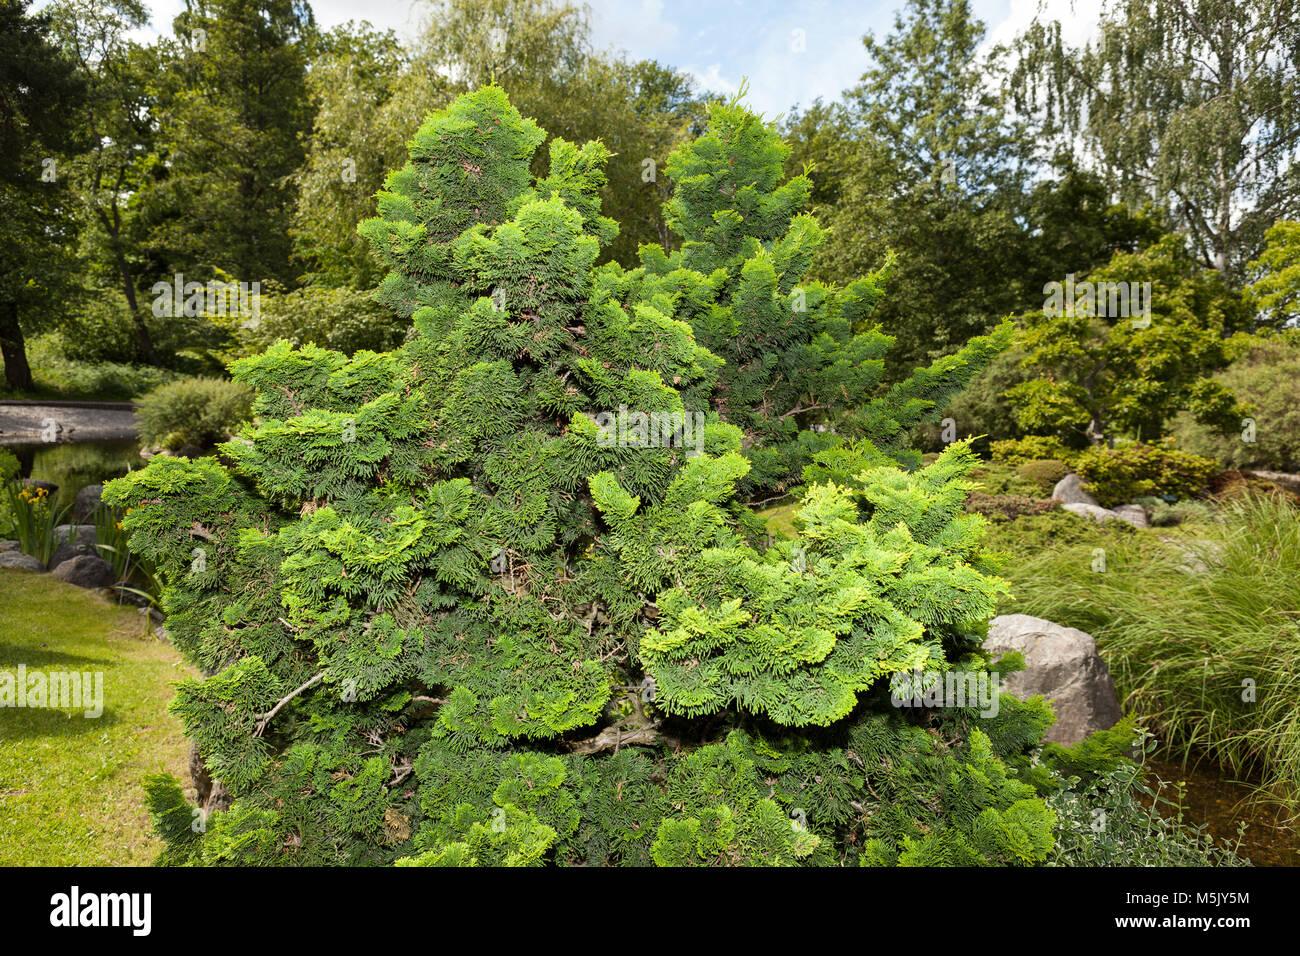 'Nana Gracilis' Japanese cypress, Japansk ädelcypress (Chamaecyparis obtusa) - Stock Image